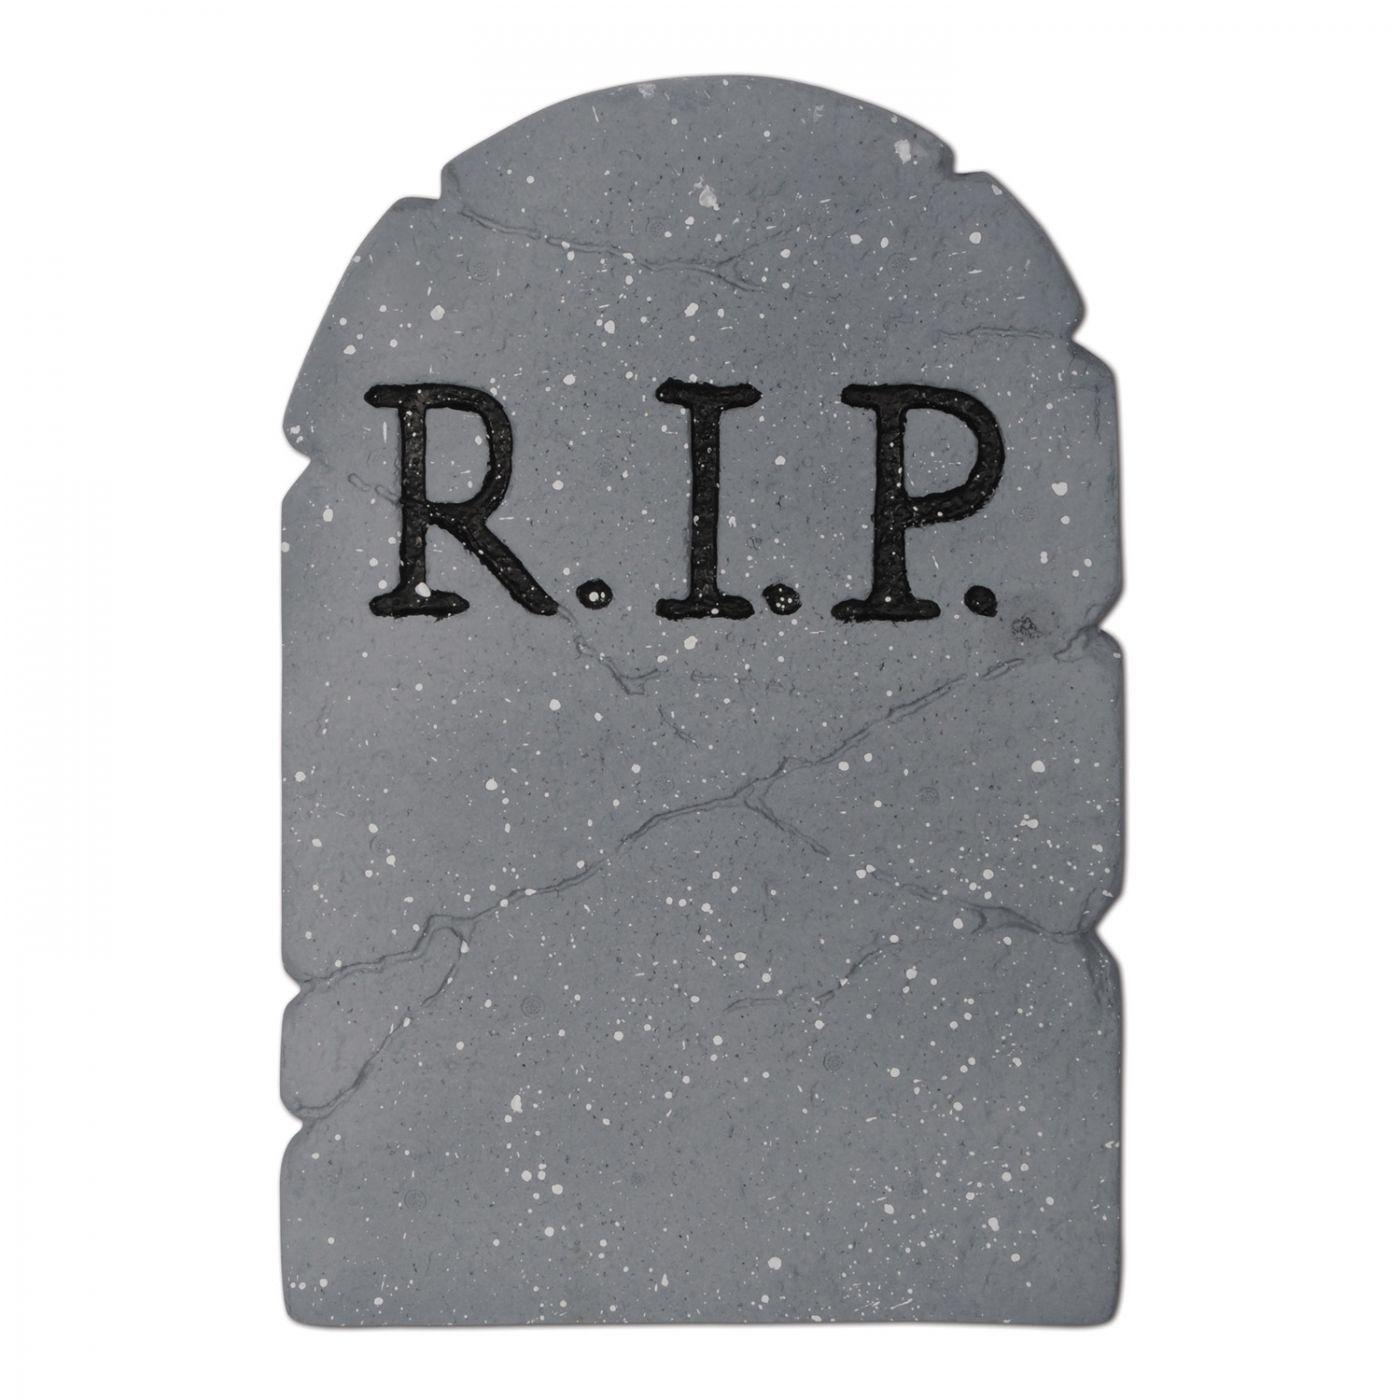 R.I.P. Tombstone (6) image